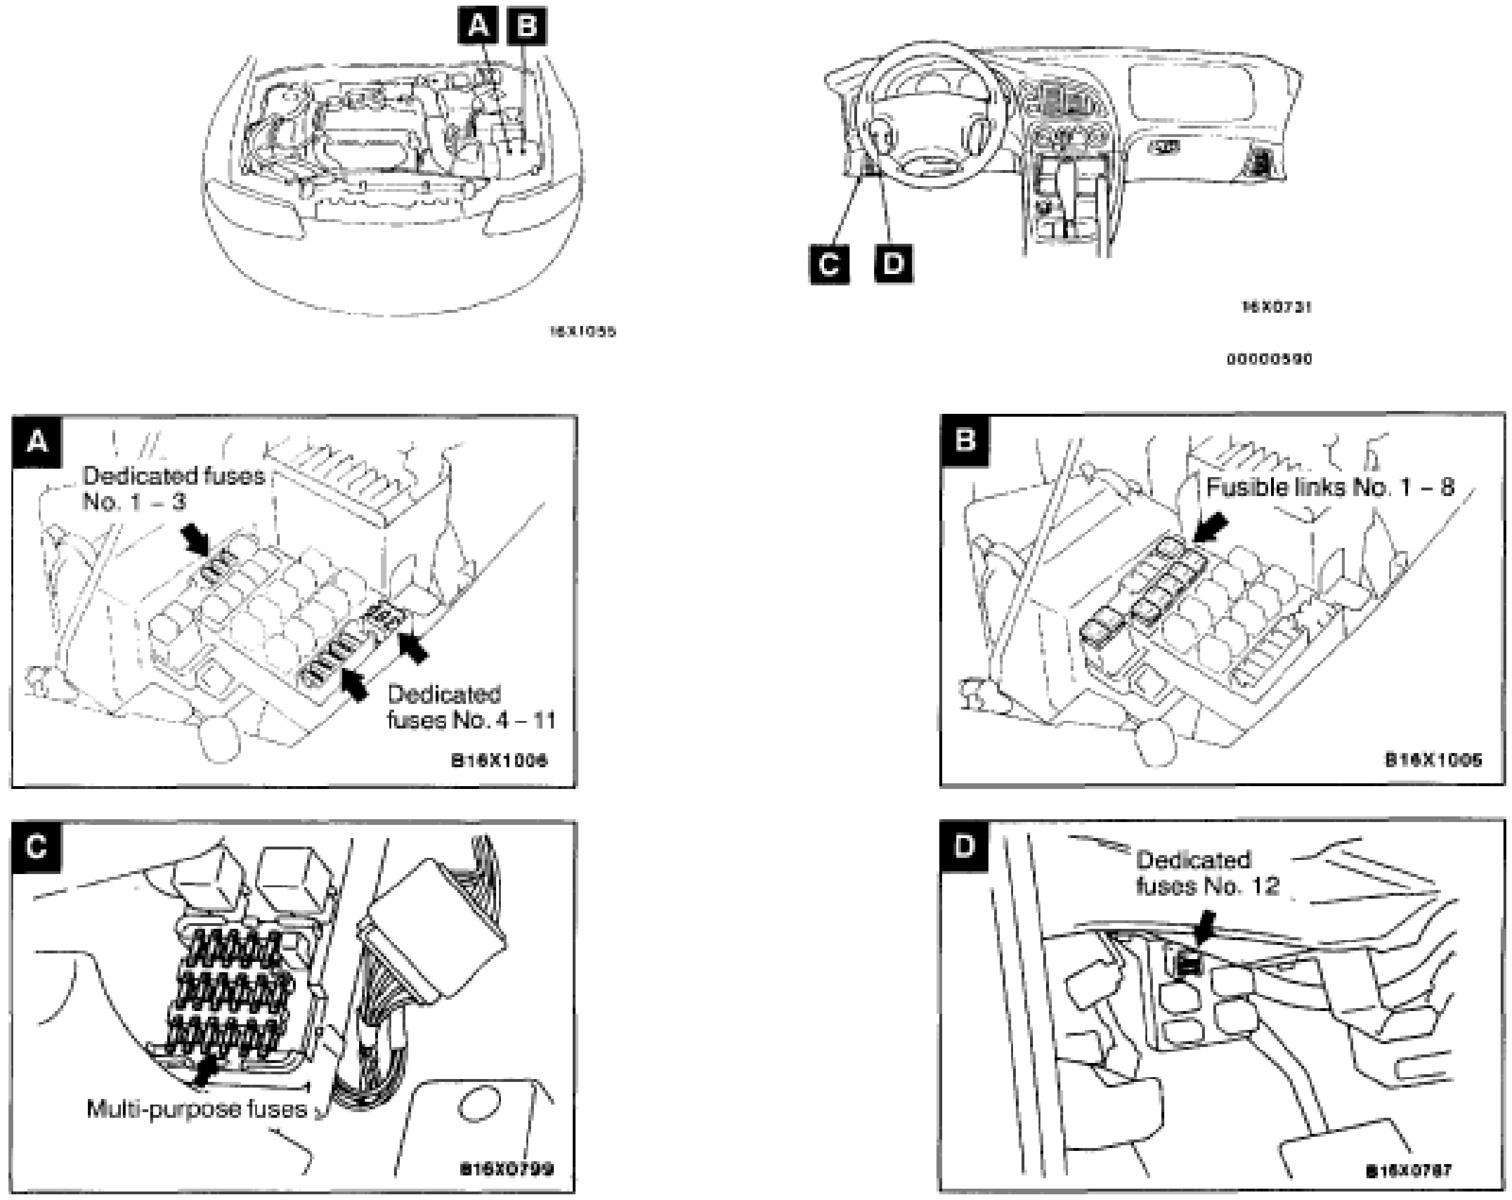 2005 chrysler sebring under hood fuse box diagram